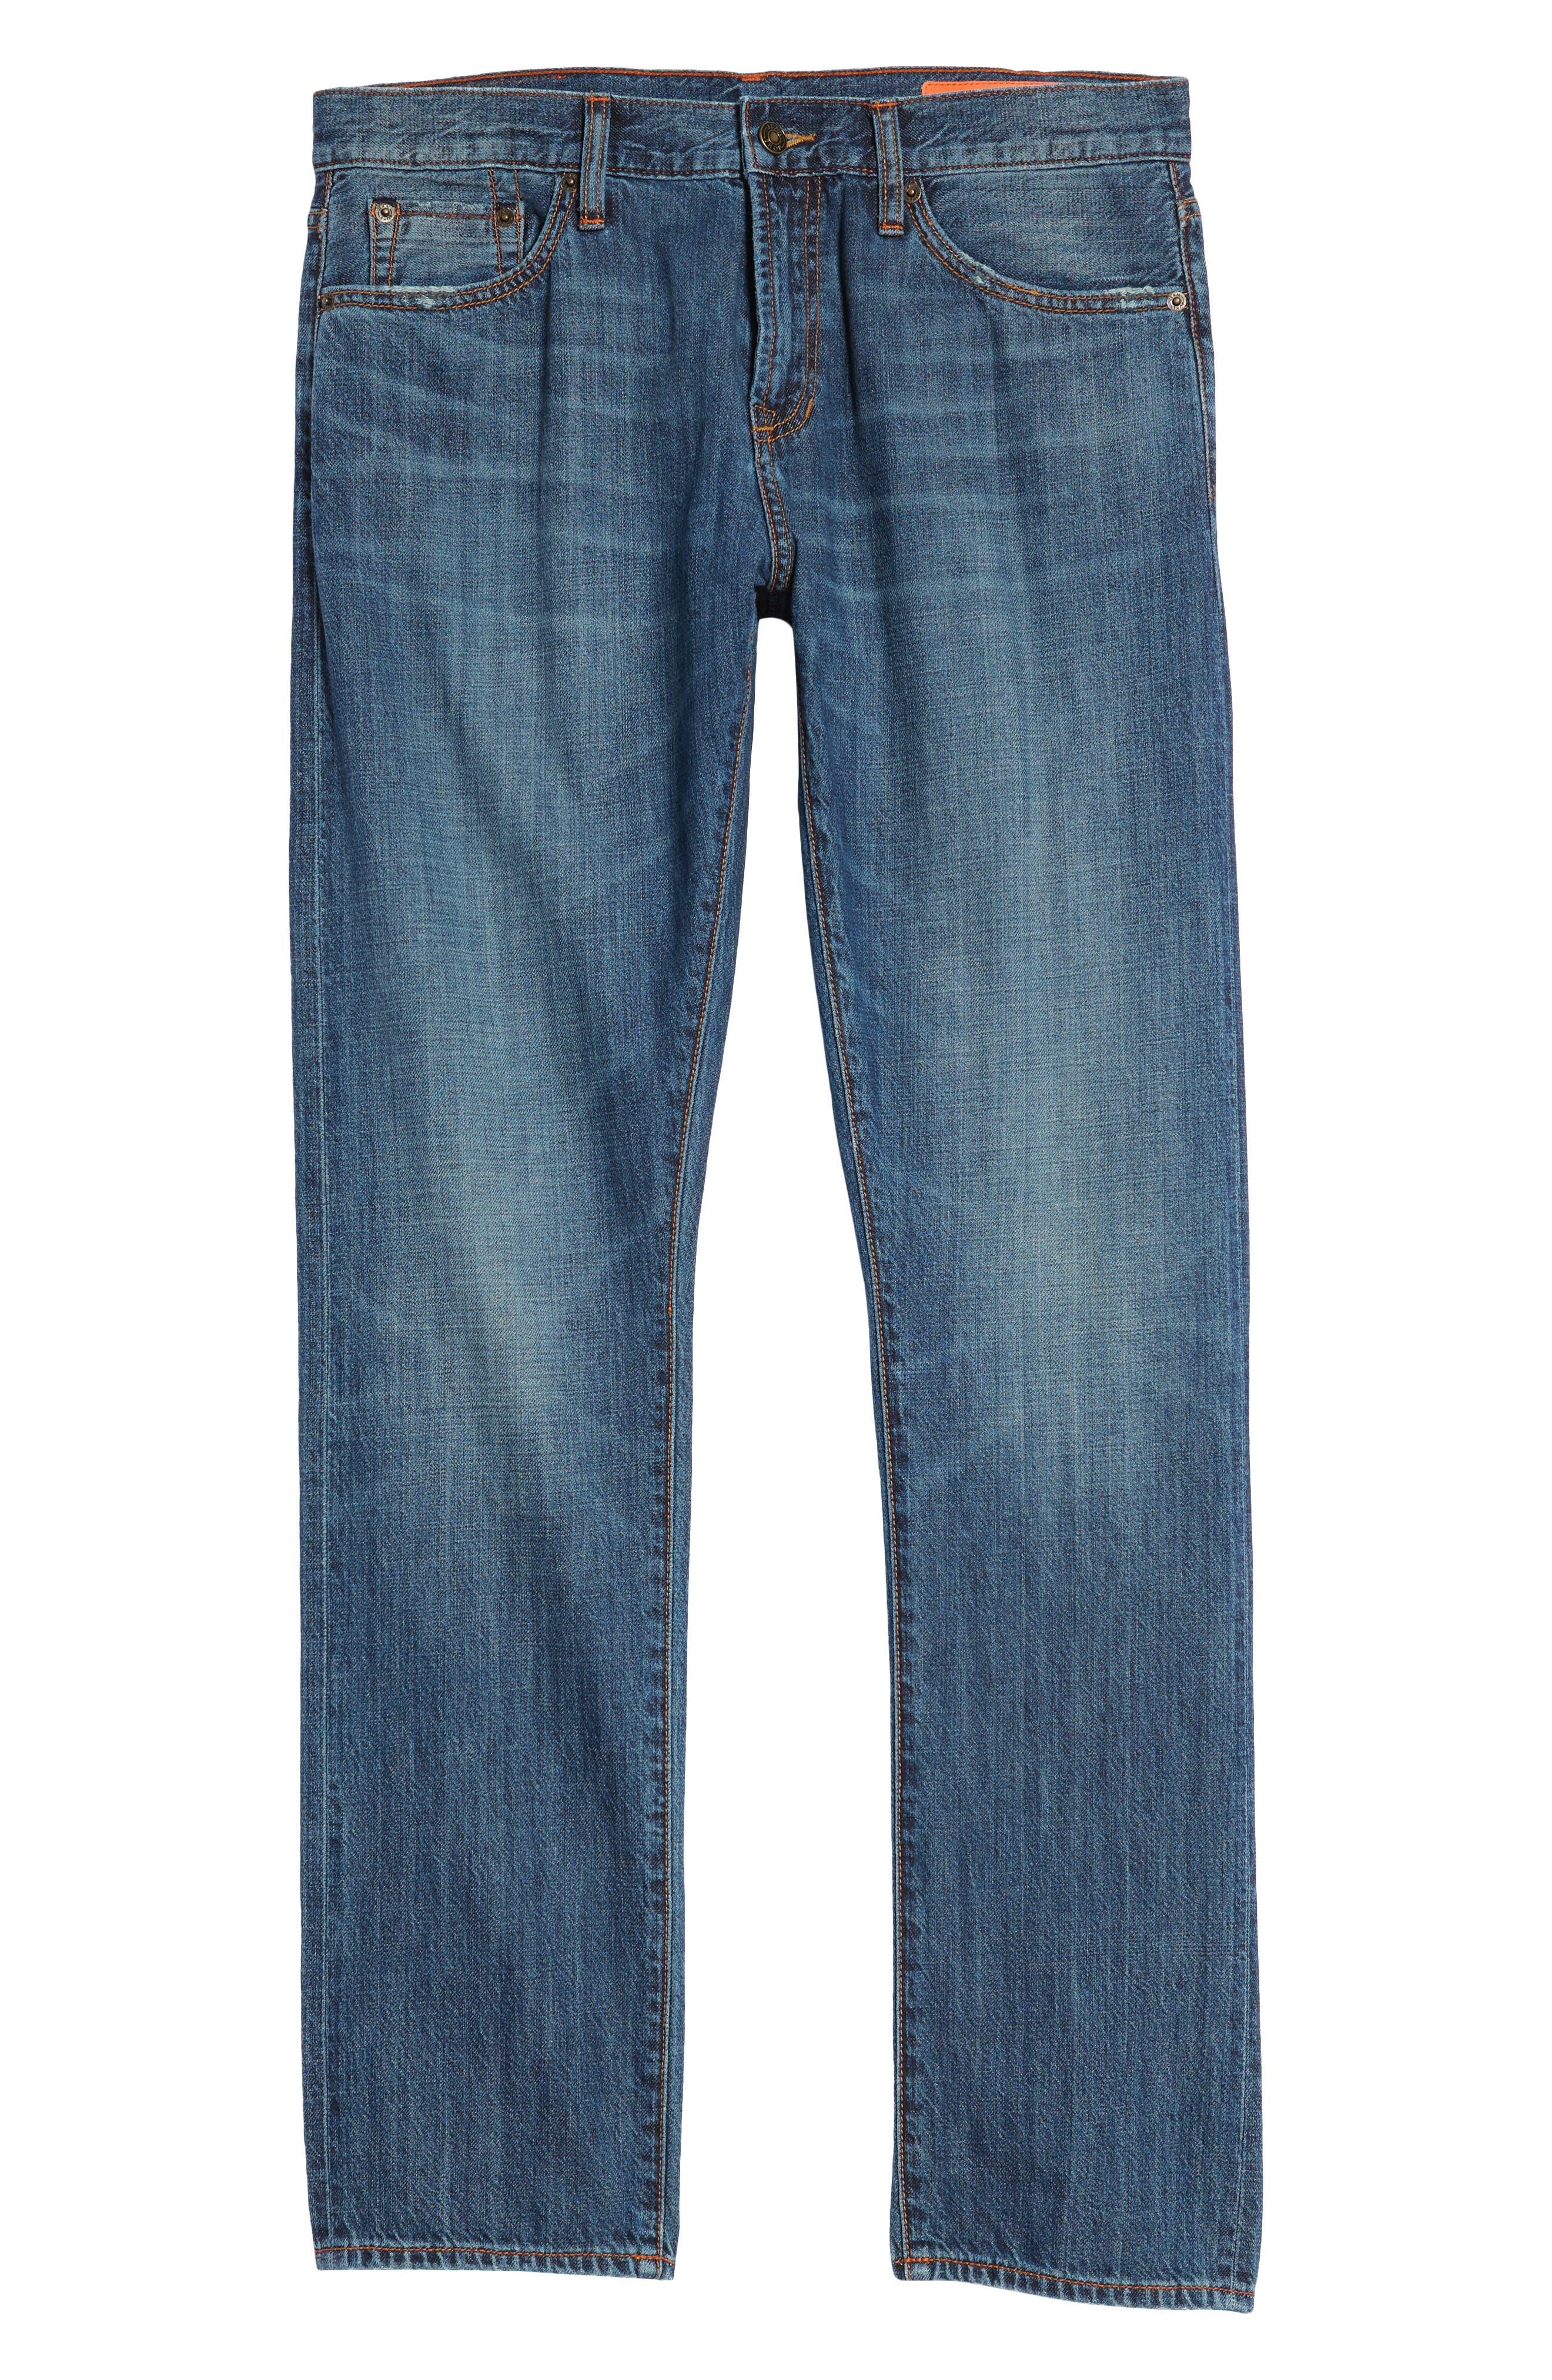 Jim Slim Fit Jeans,                             Alternate thumbnail 6, color,                             Greenwood